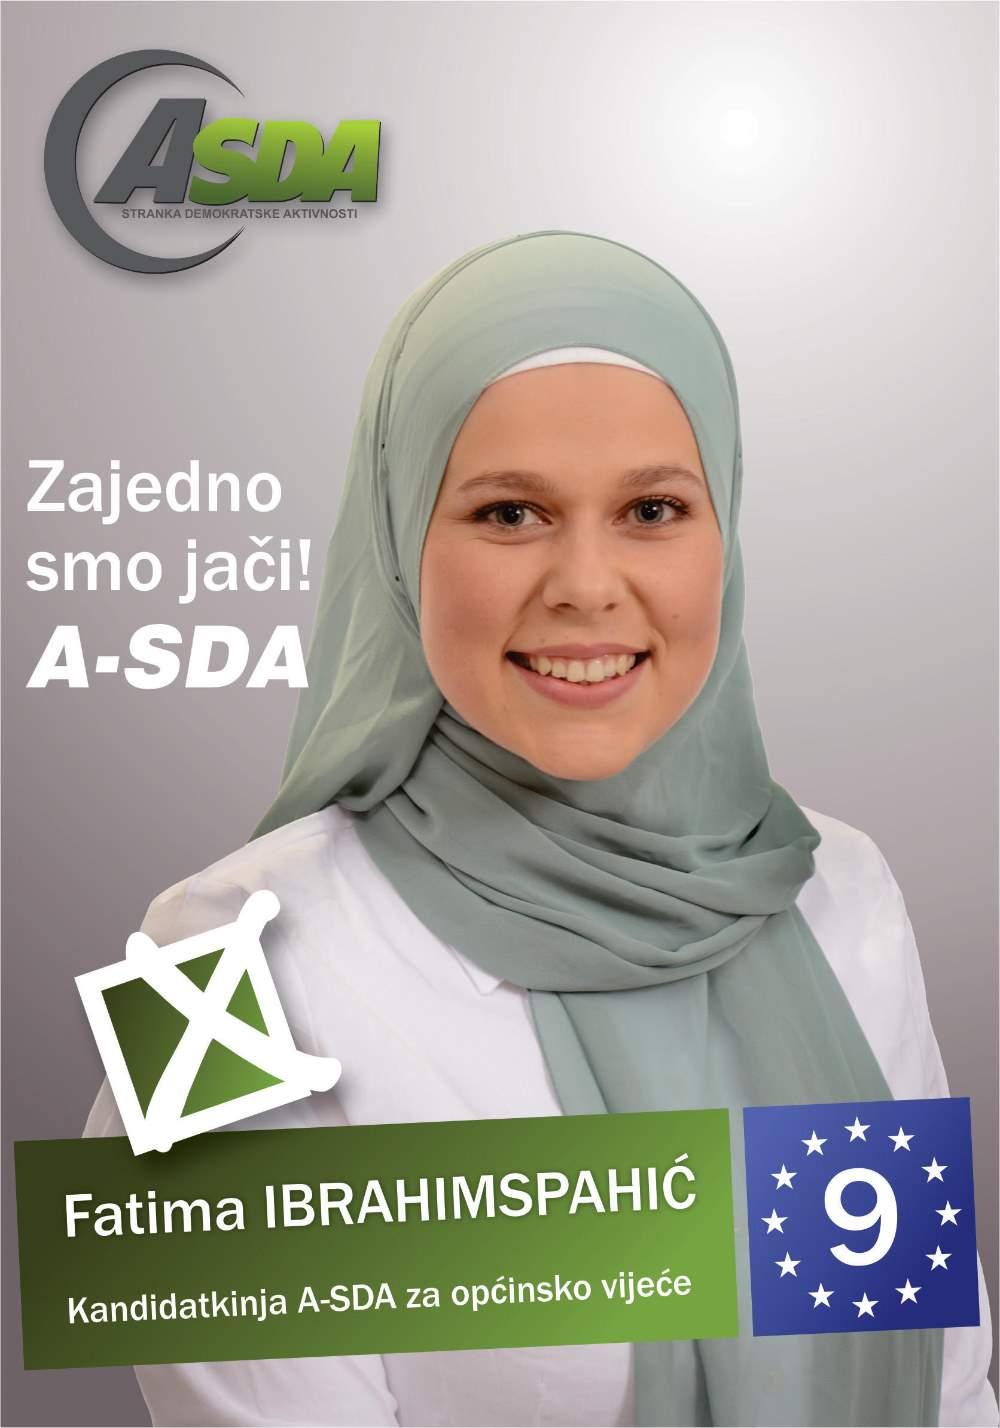 Fatima Ibrahimspahić